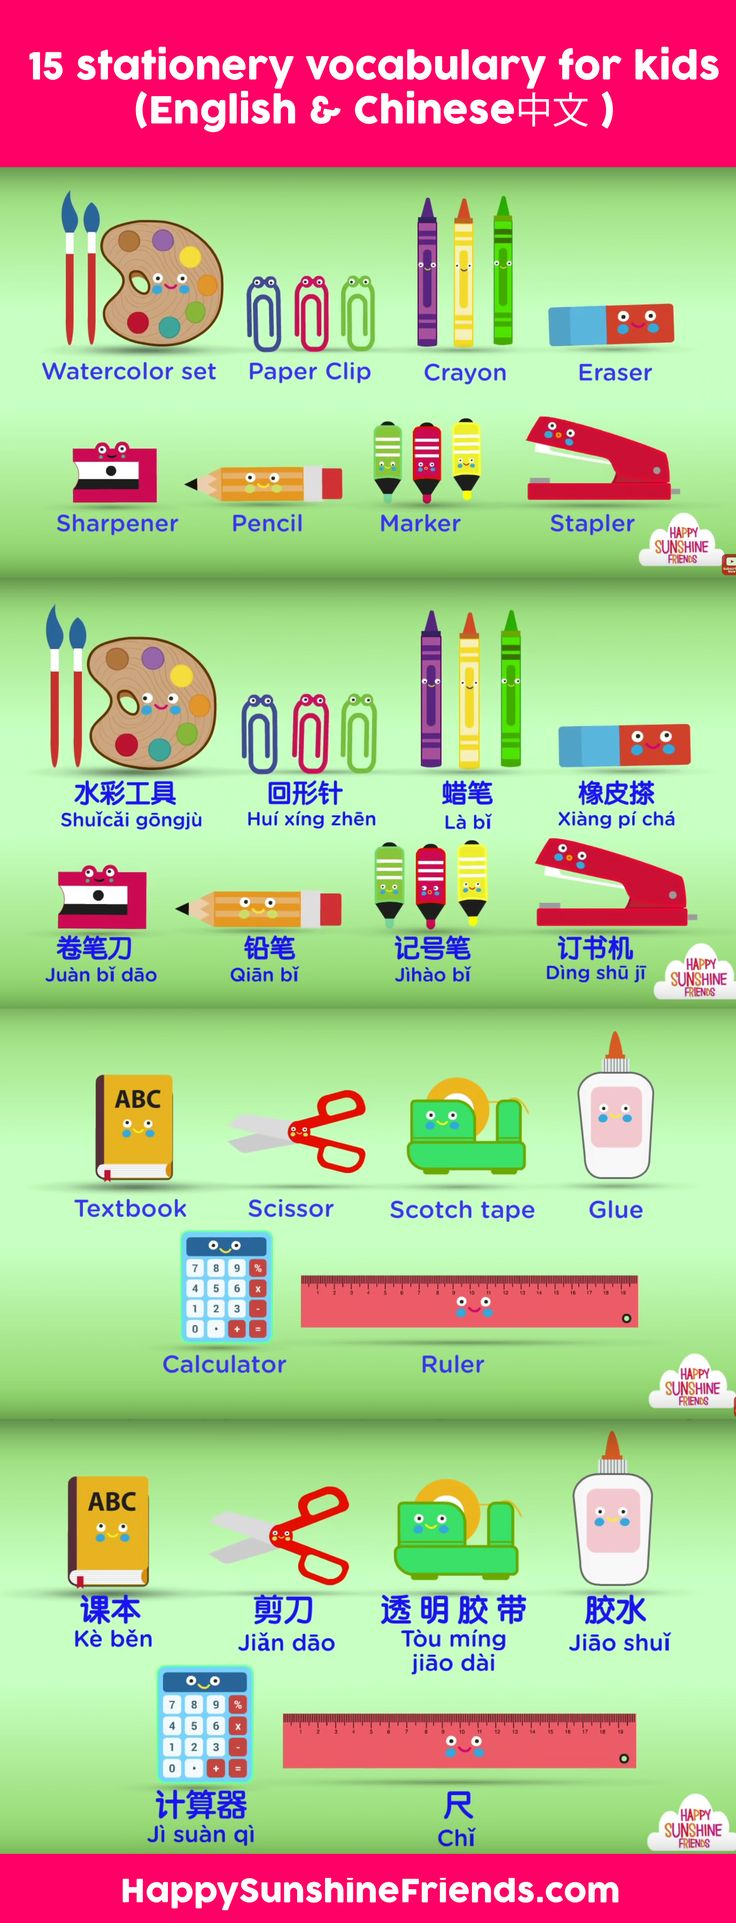 7 best Chinese images on Pinterest   Children songs, Kids learning ...